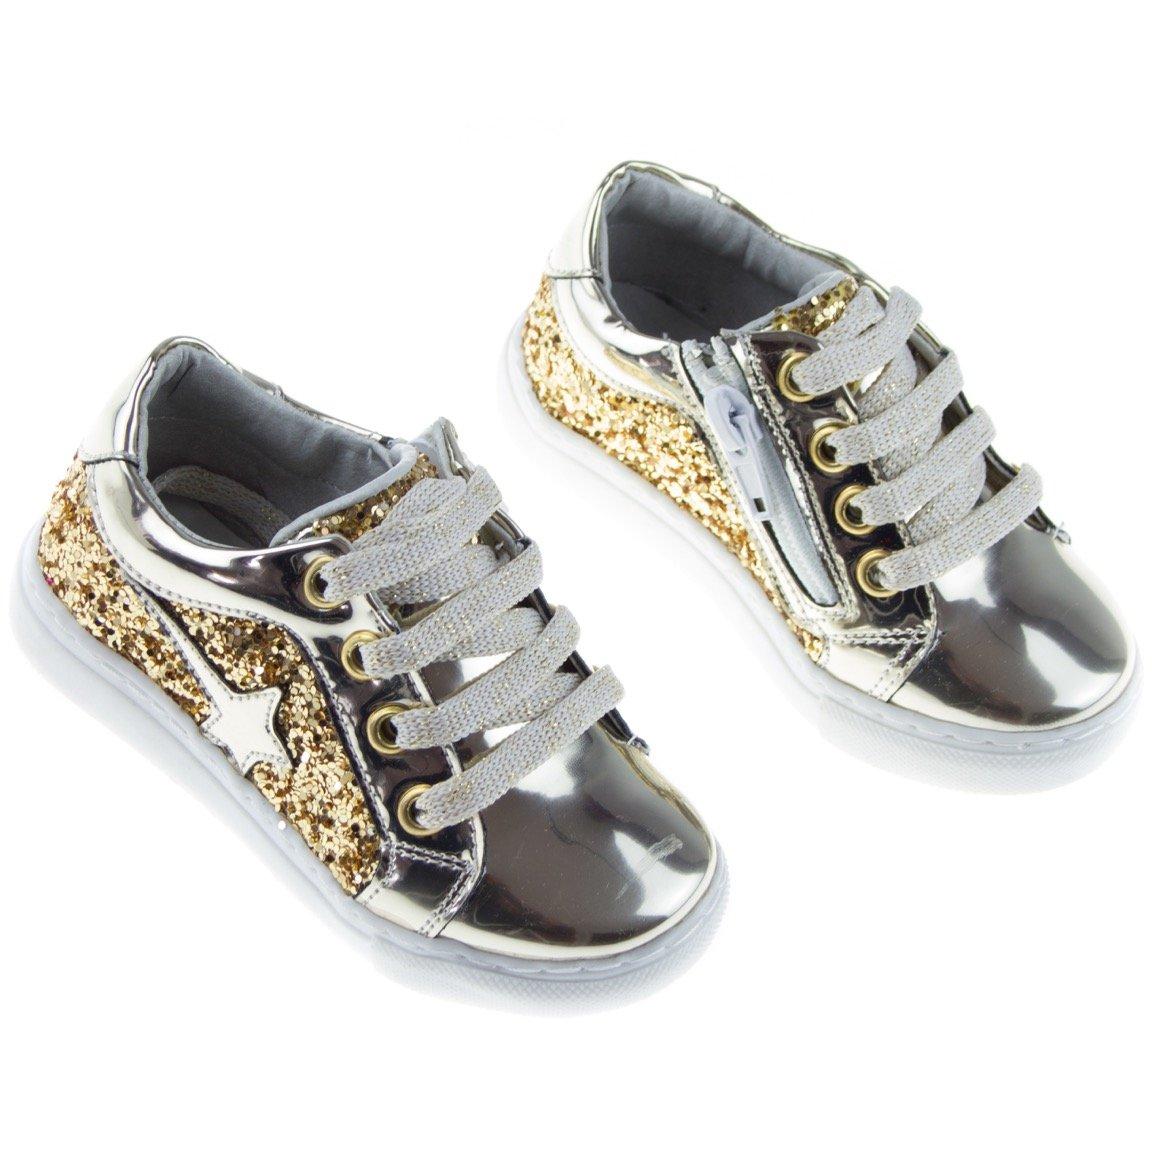 Miss Brava-Harli παιδικά παπούτσια «Golden Star»